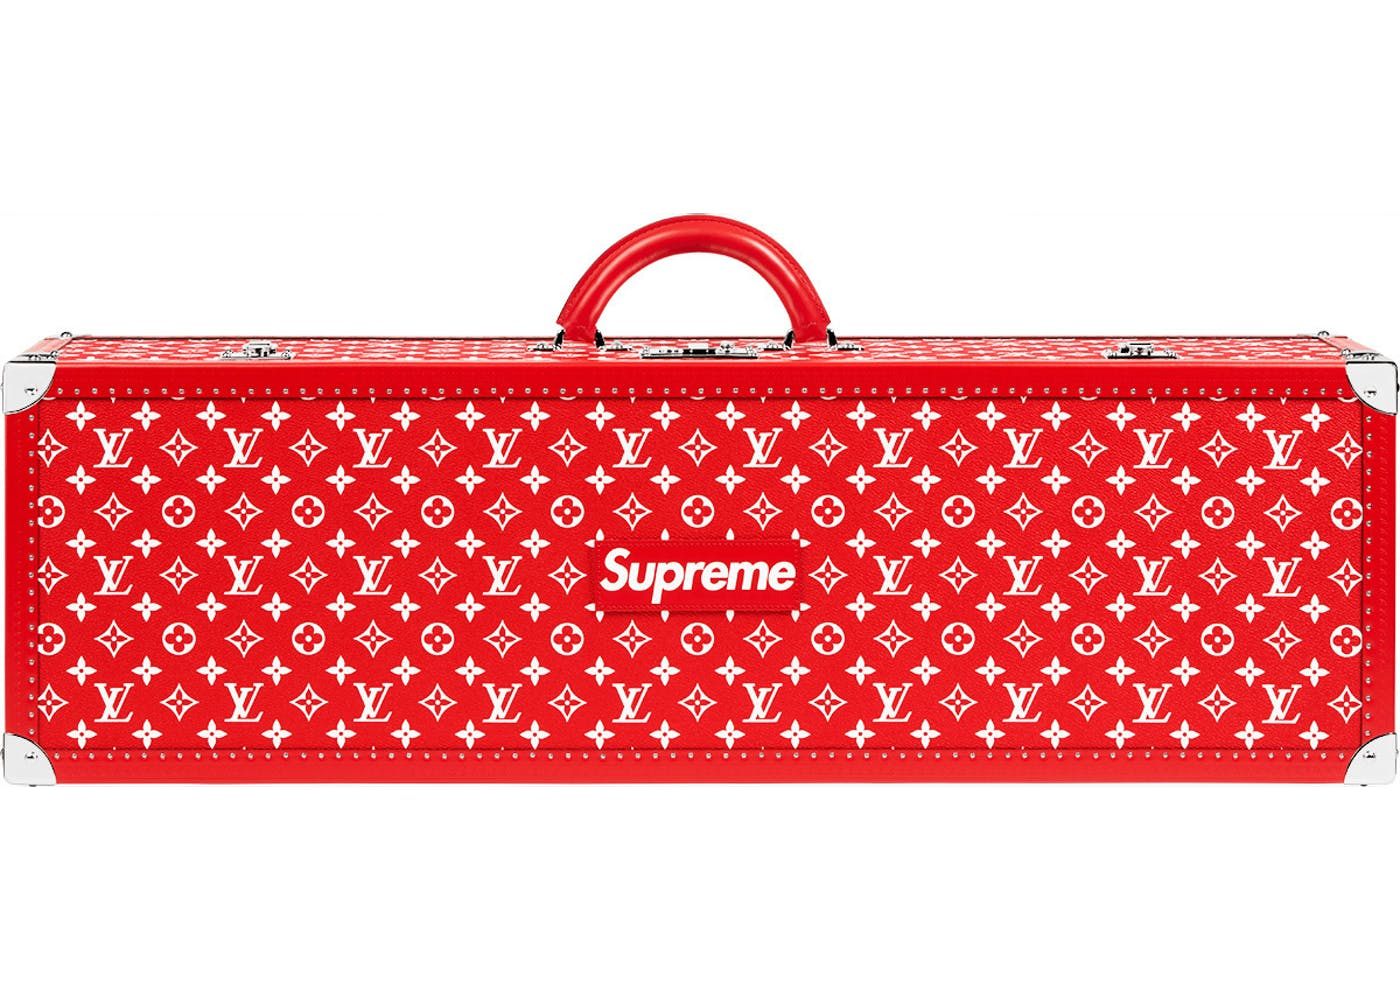 louis vuitton x supreme boite skateboard trunk monogram red. Black Bedroom Furniture Sets. Home Design Ideas